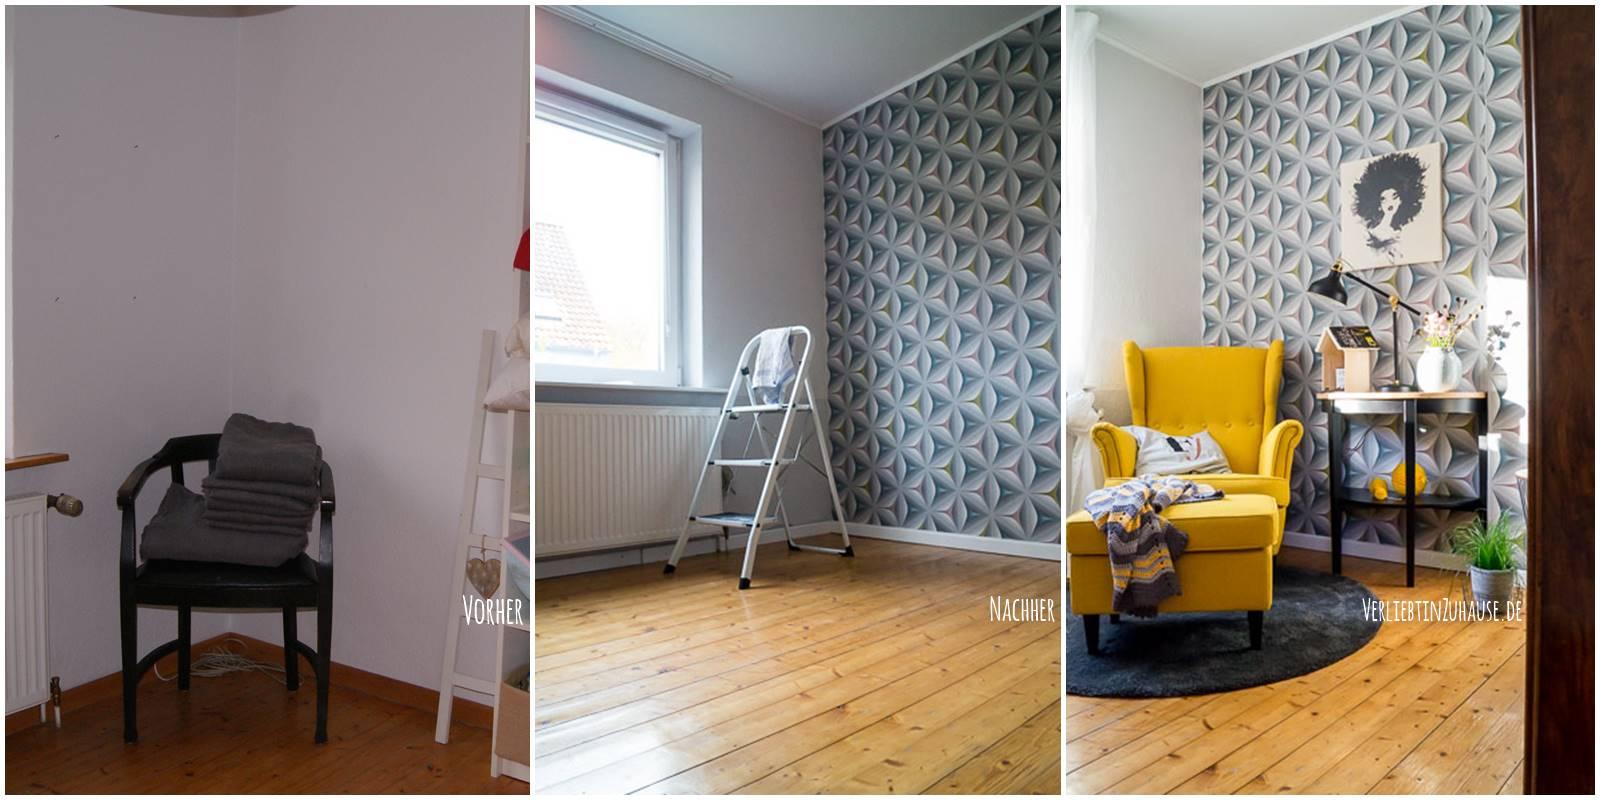 zimmer gestalten moderne deko jenseits des glaubens. Black Bedroom Furniture Sets. Home Design Ideas